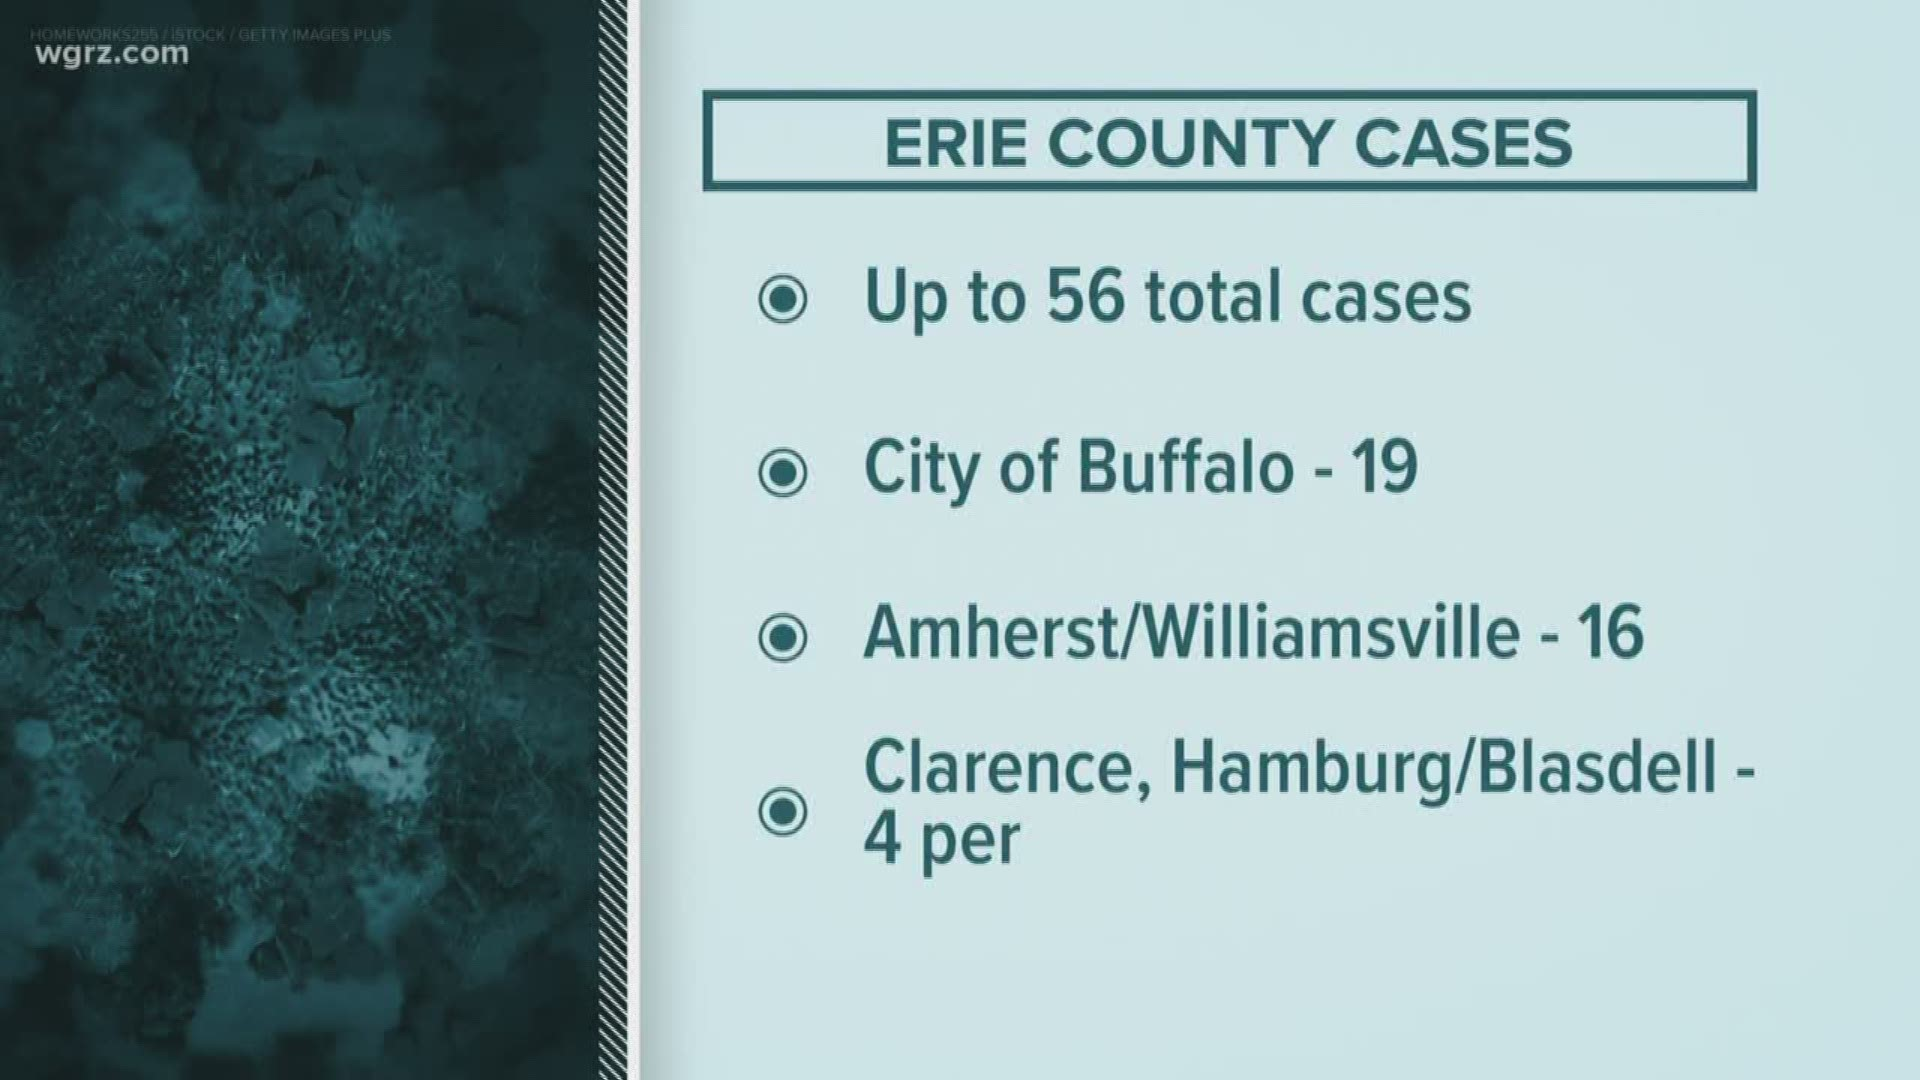 Erie County Executive Hopeful More Coronavirus Test Kits Arrive Next Week 11alive Com